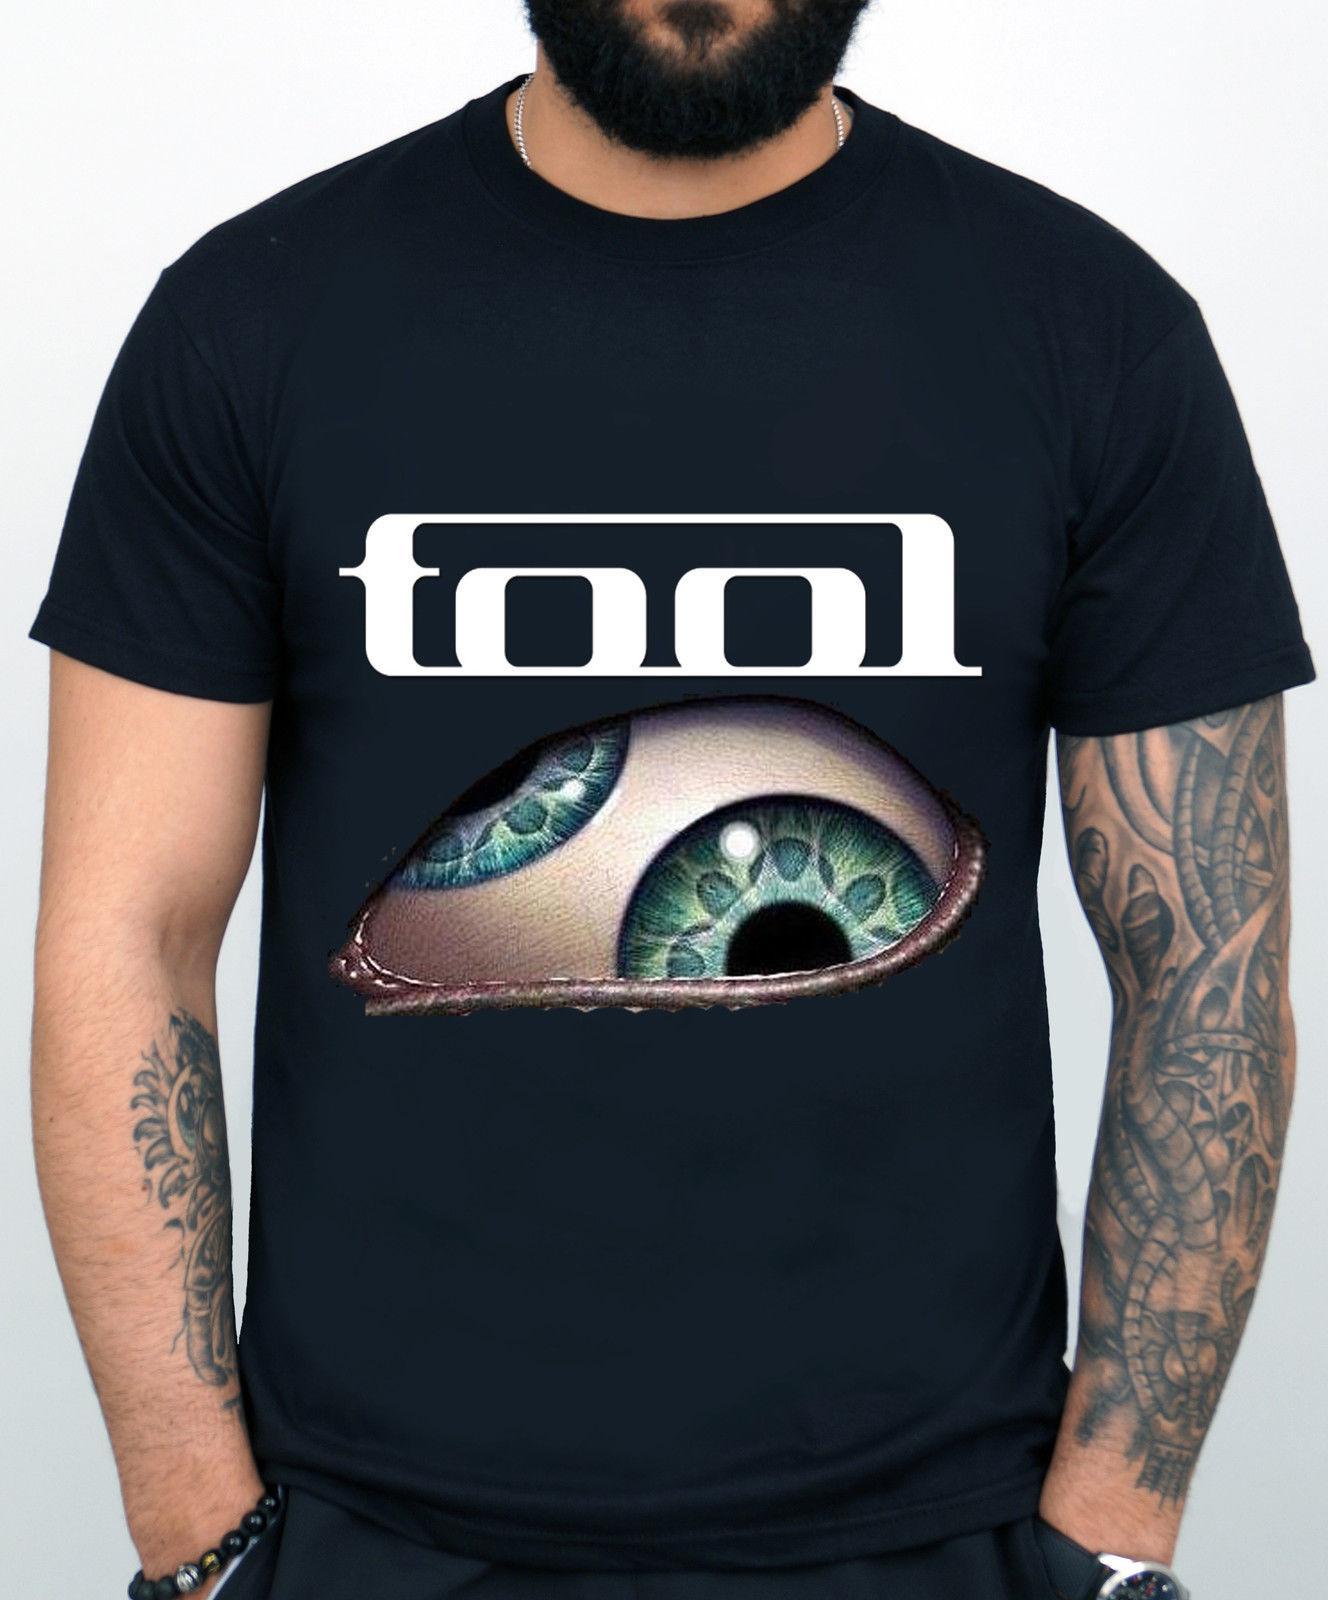 Band Shirt Strumento T Nero Maglietta Rock Acquista WEHIY9D2